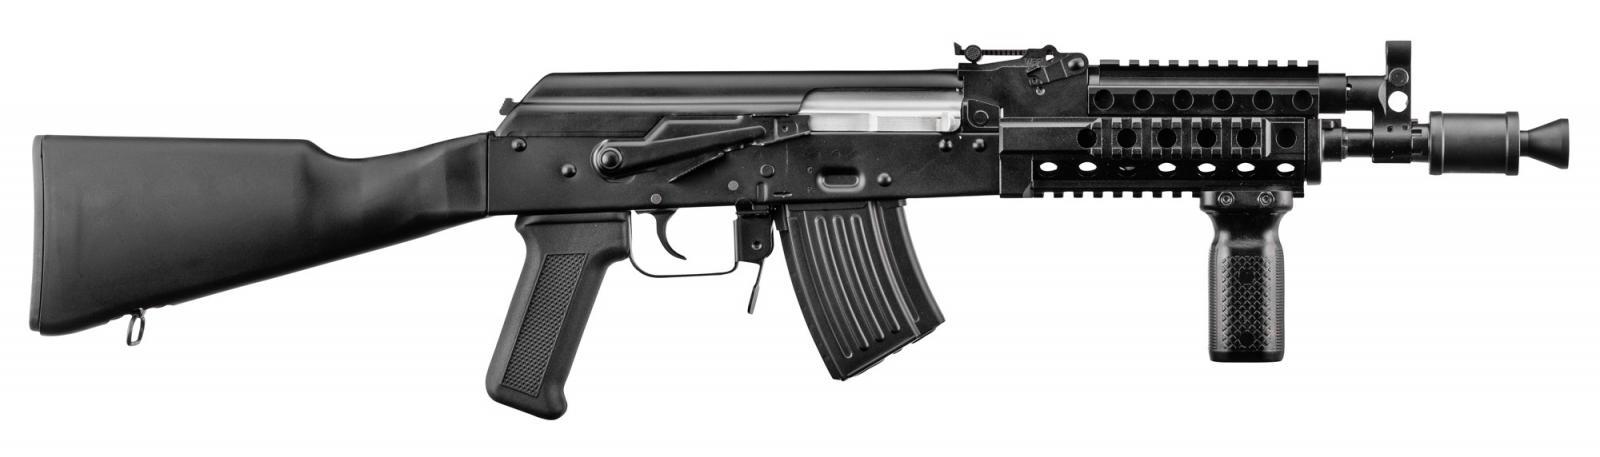 Carabine WBP MINI JACK Cal 7.62x39